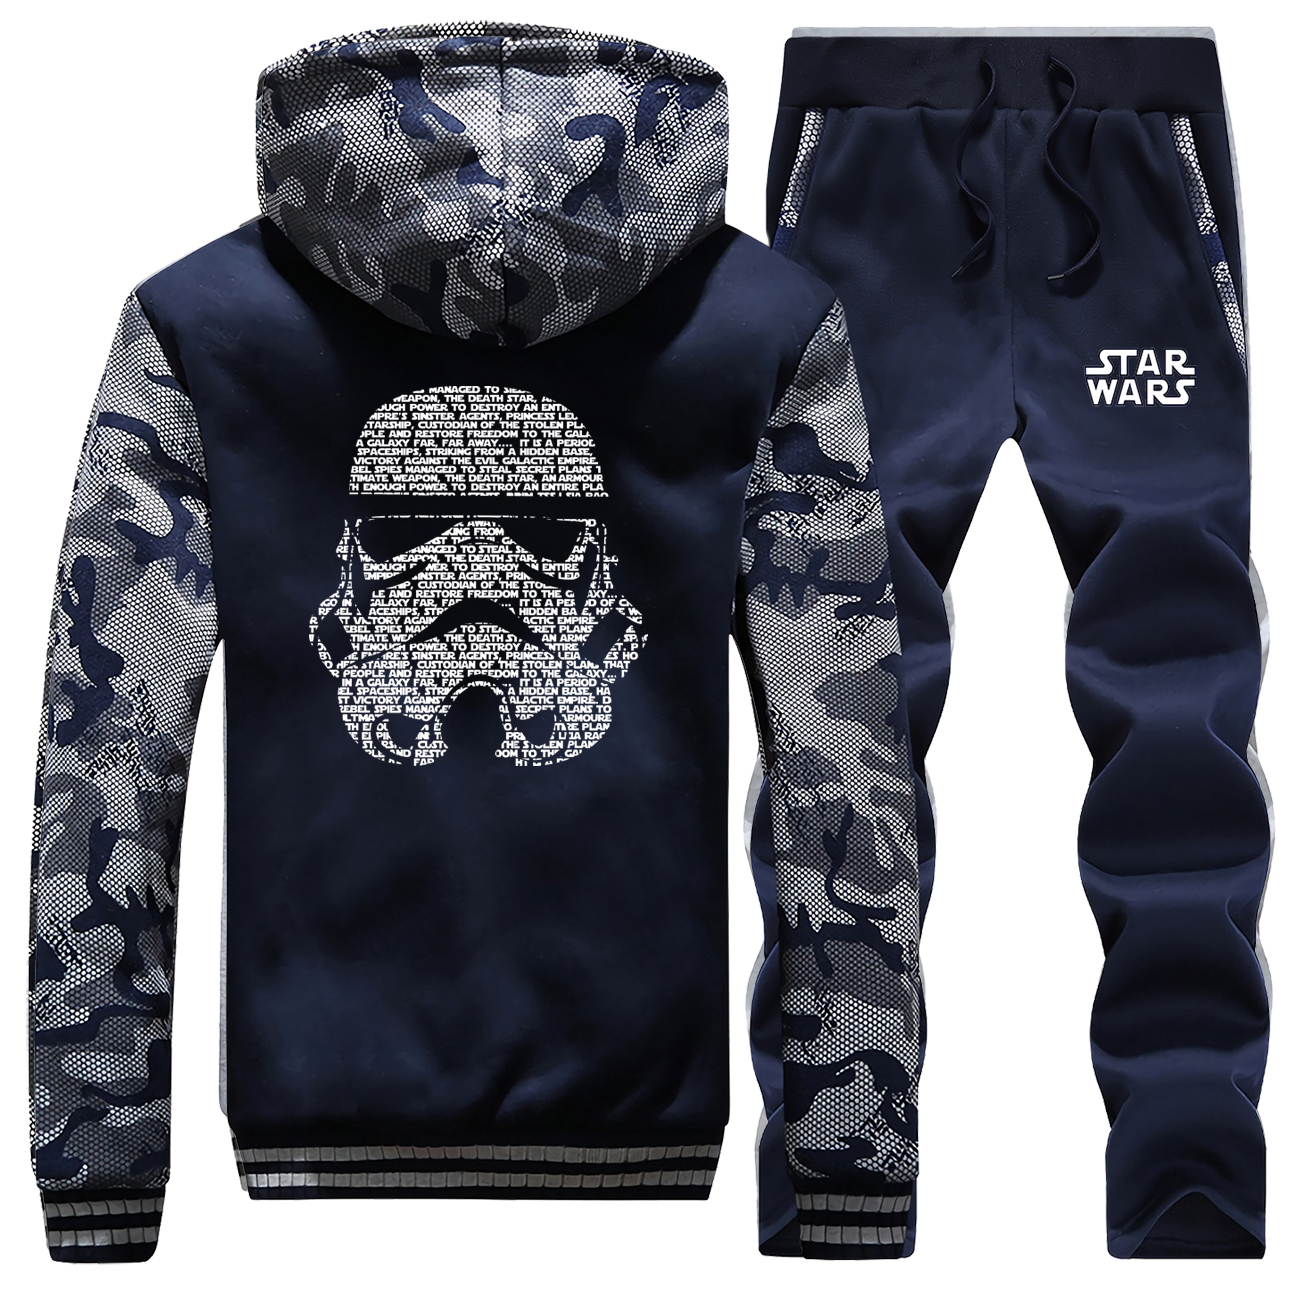 Star Wars Fleece Hoodie Sweatshirts Men Coat Sets Winter Men's Jacket+Pants 2 Piece Set Streetwear Fashion Brand Hoodies Suit